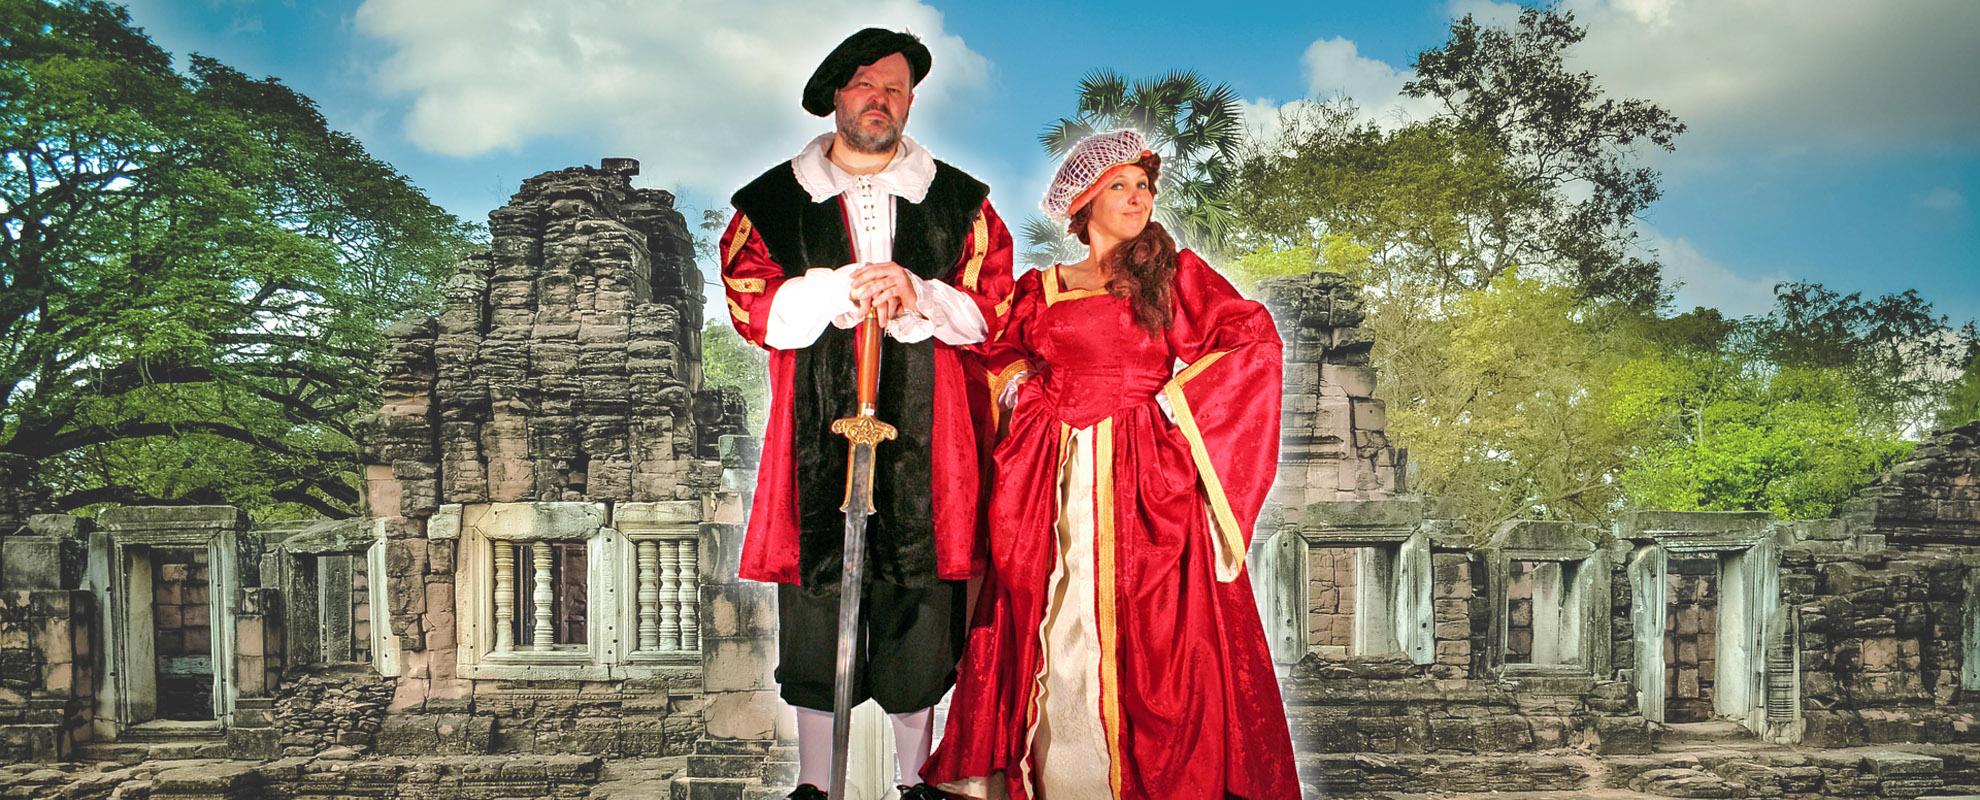 Mittelalter Kostüm Nürnberg